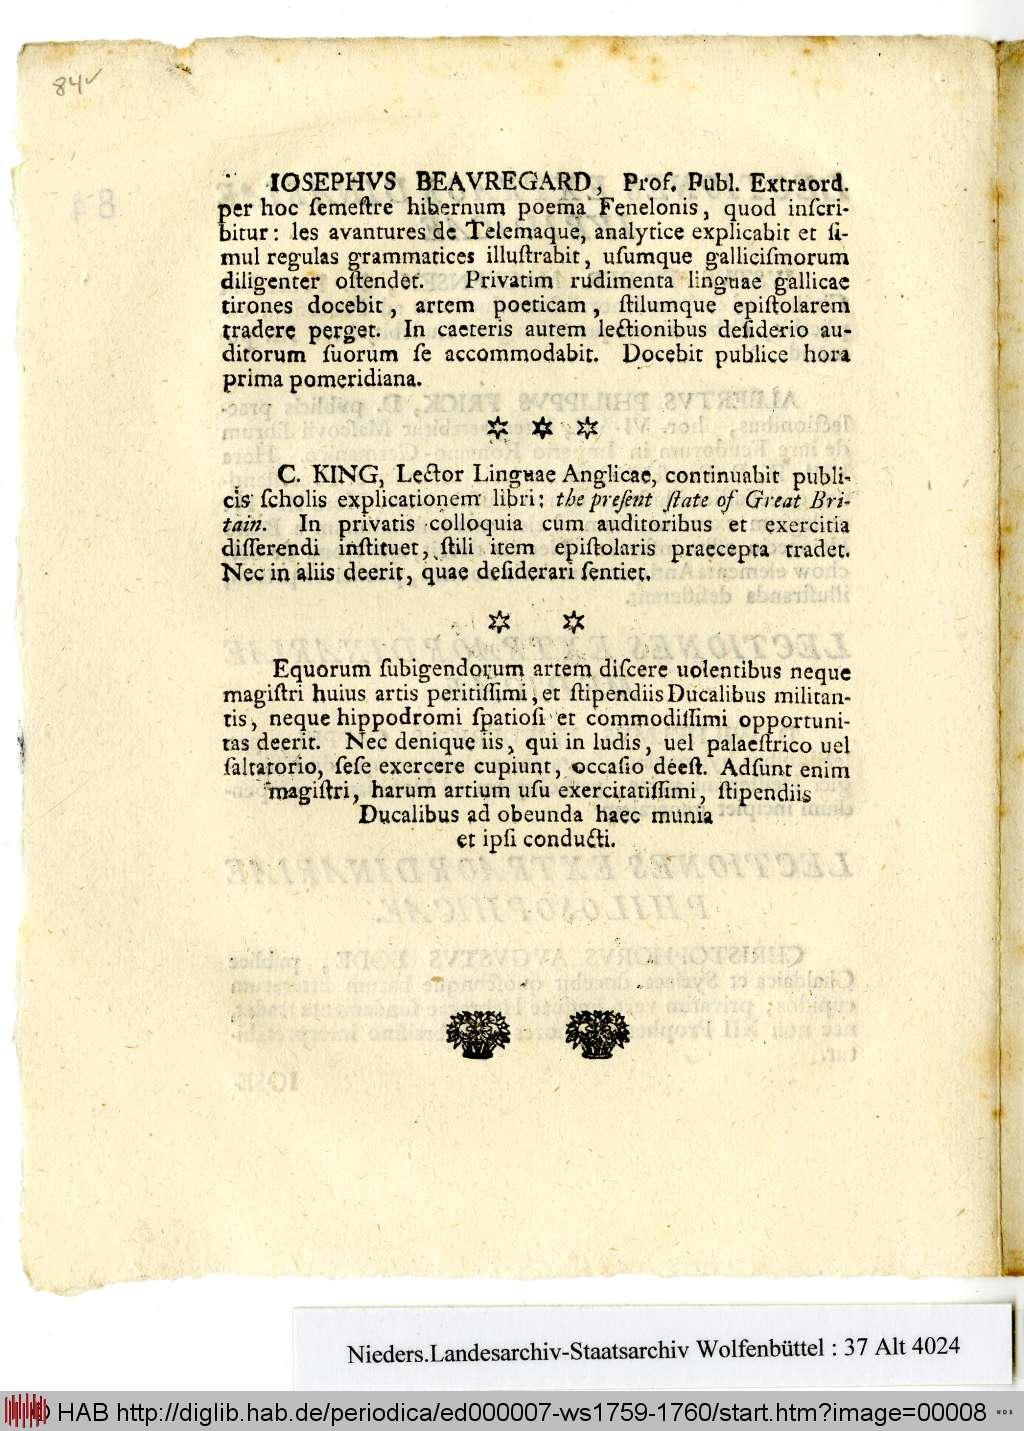 https://diglib.hab.de/periodica/ed000007-ws1759-1760/00008.jpg